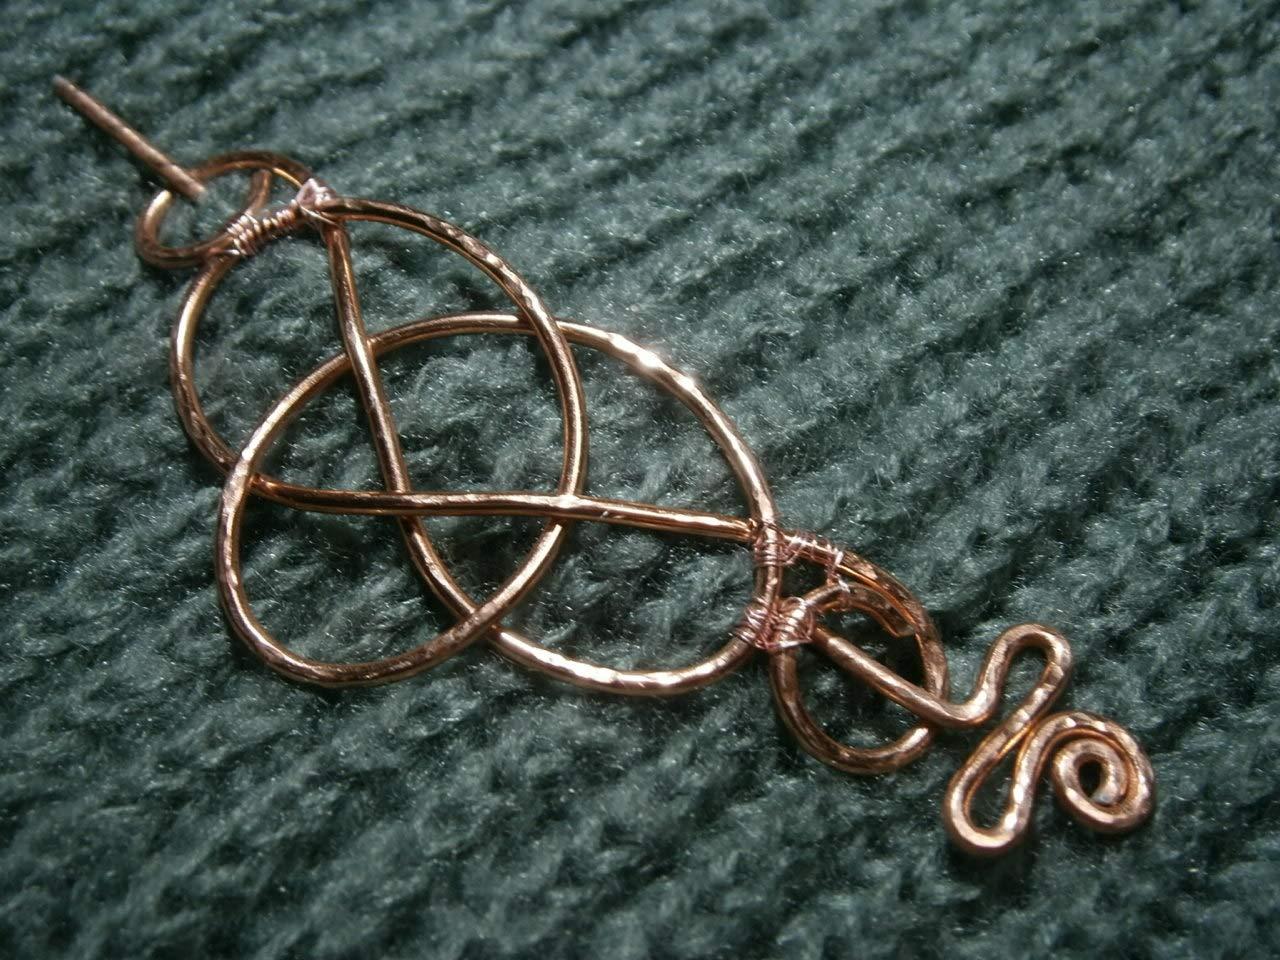 Tuchnadel celtic knot 90 x 40 Millimeter geh/ämmert keltischer Knoten Aluminium in Farbe kupfer rosegold